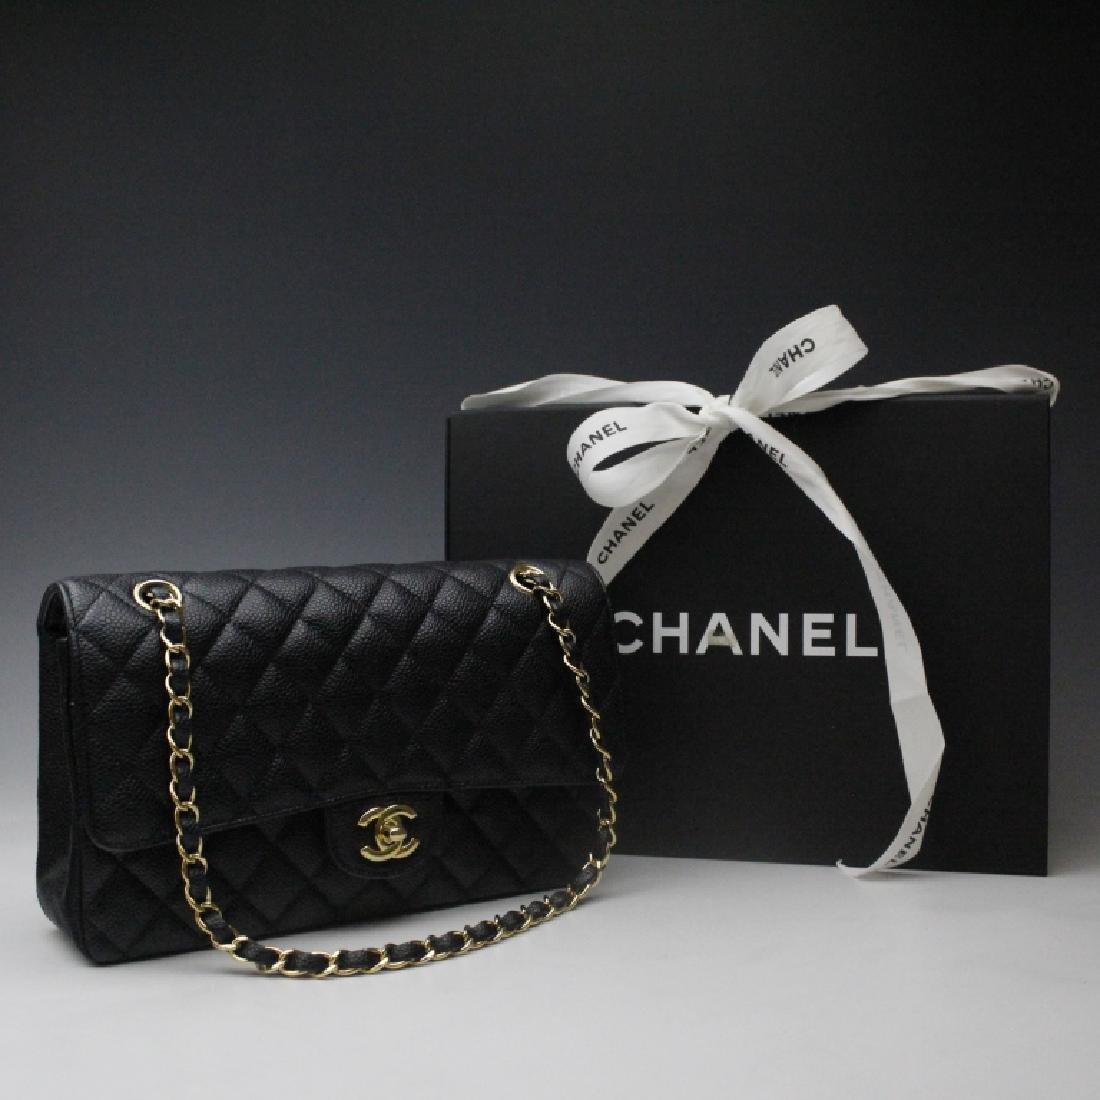 CHANEL Classic Double Flap Black Handbag Purse